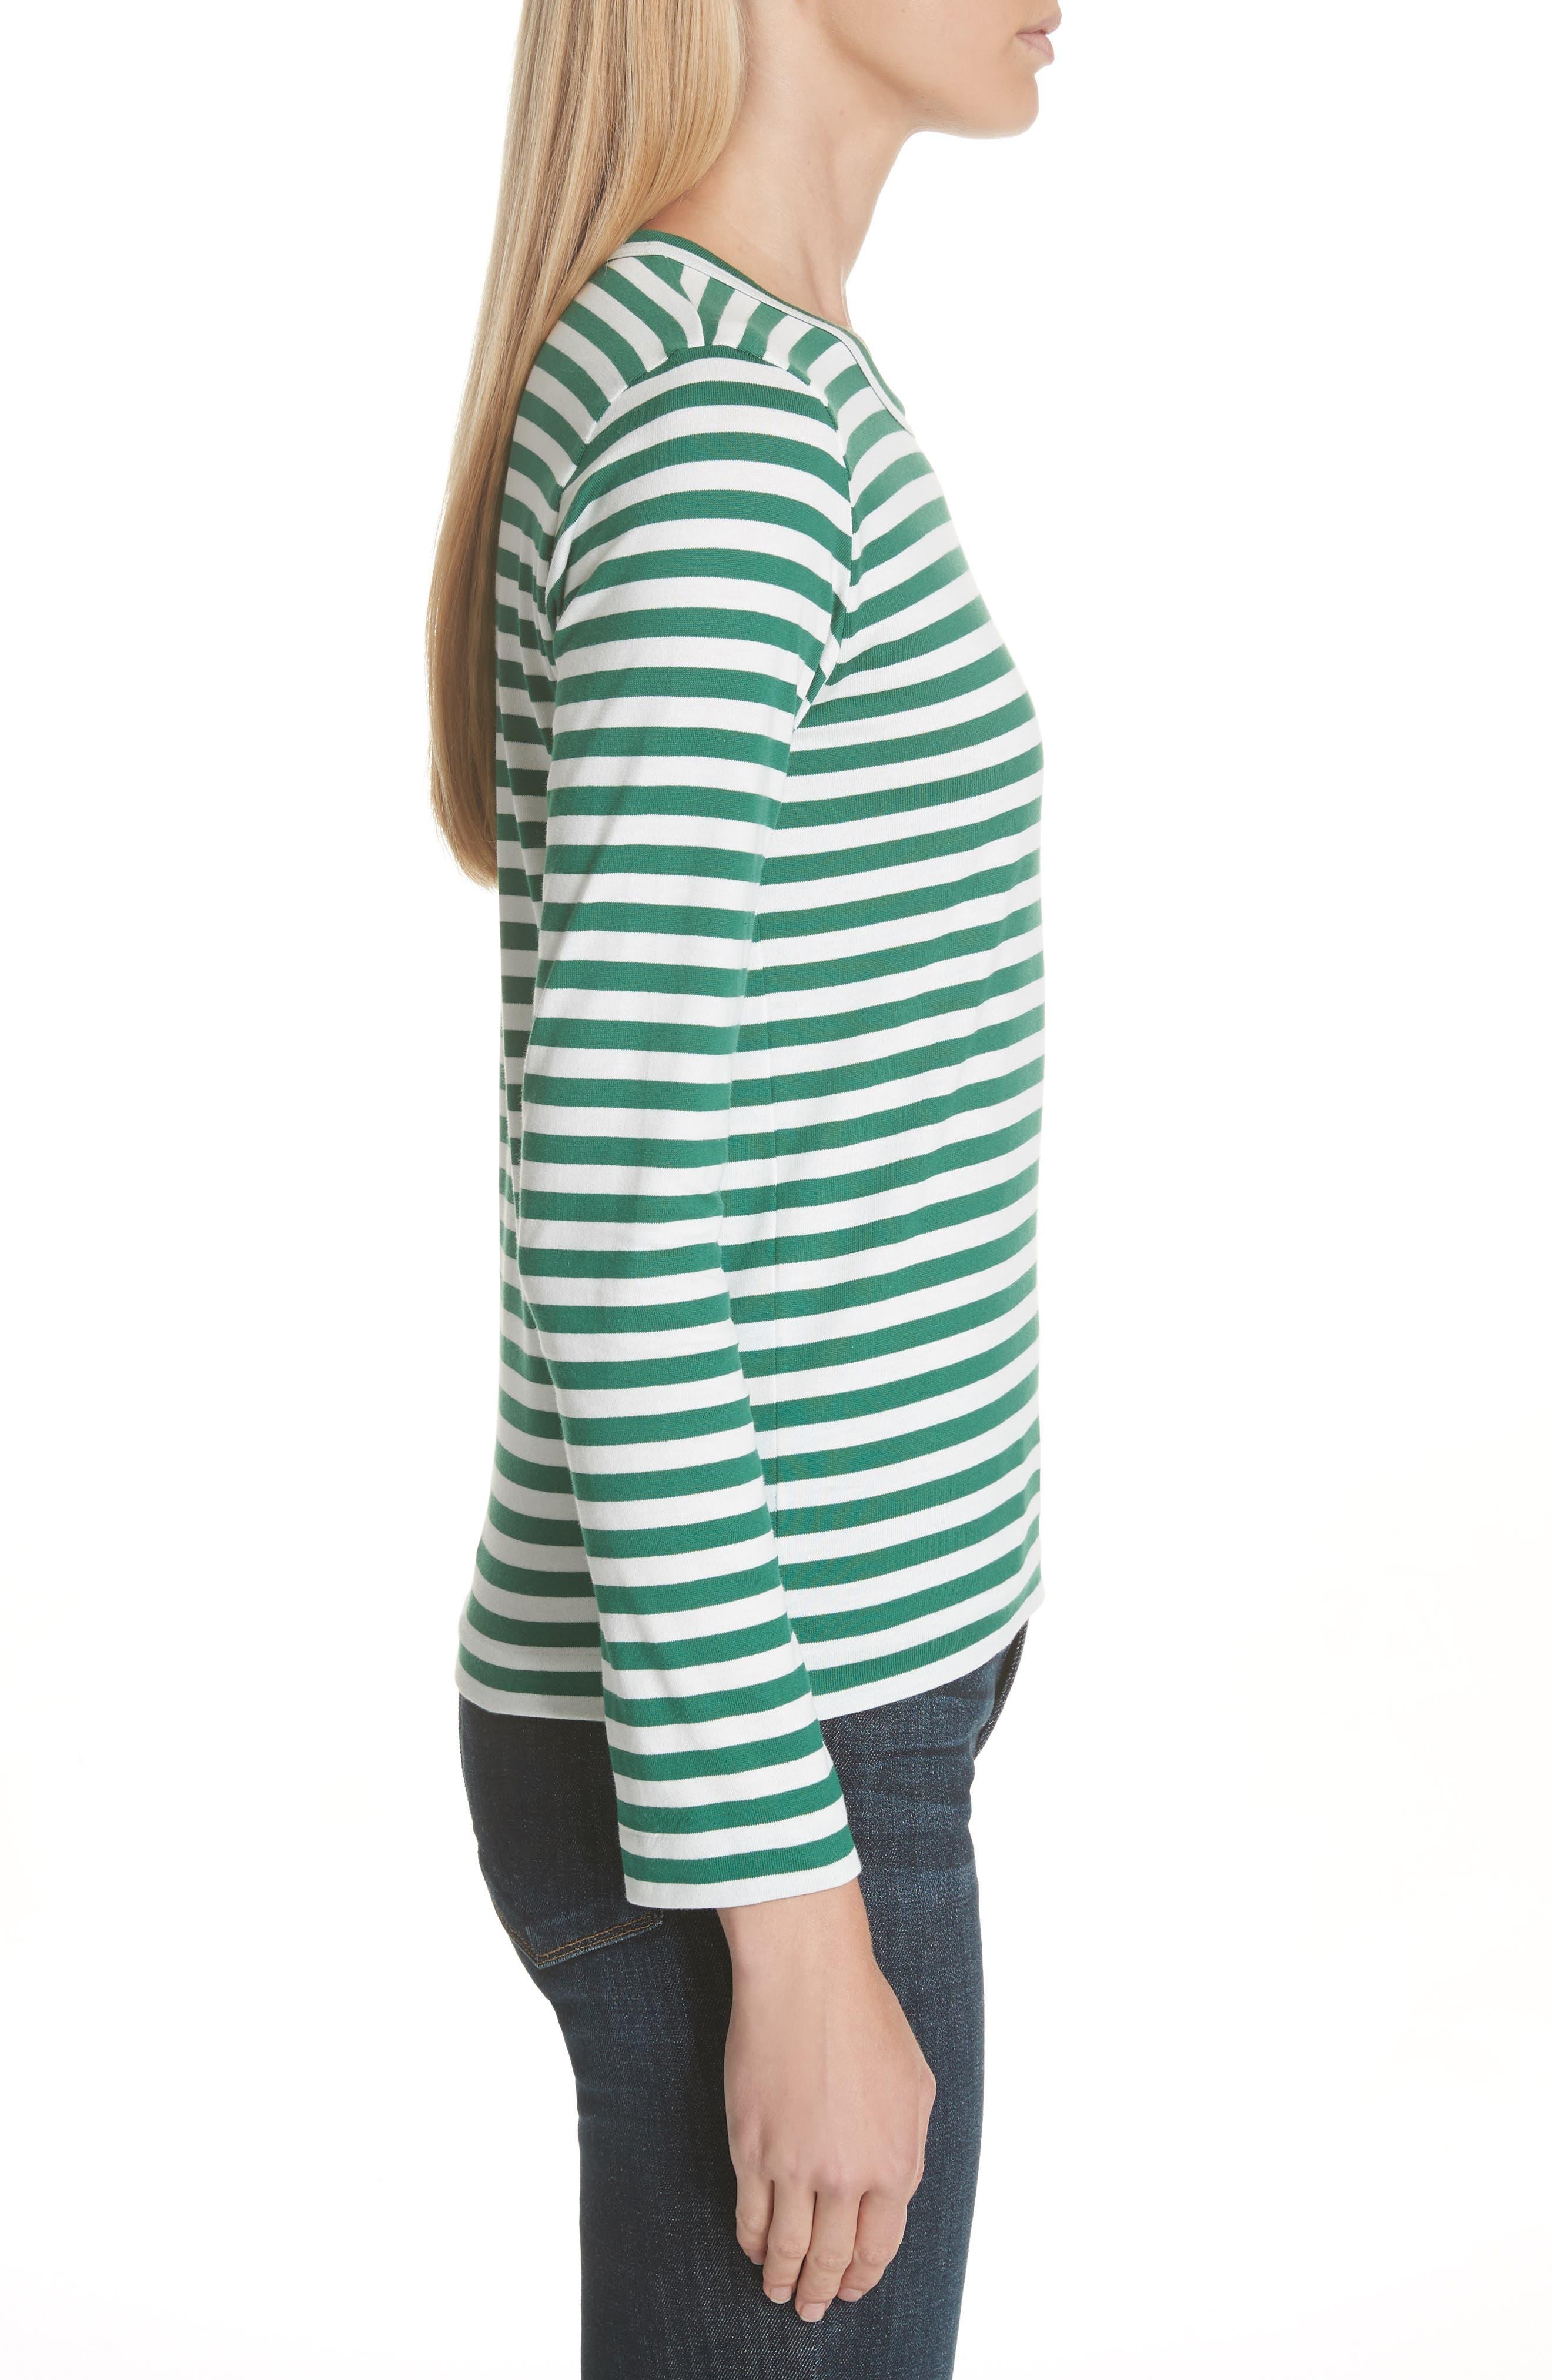 Comme des Garçons PLAY Stripe Cotton Tee,                             Alternate thumbnail 3, color,                             GREEN/ WHITE